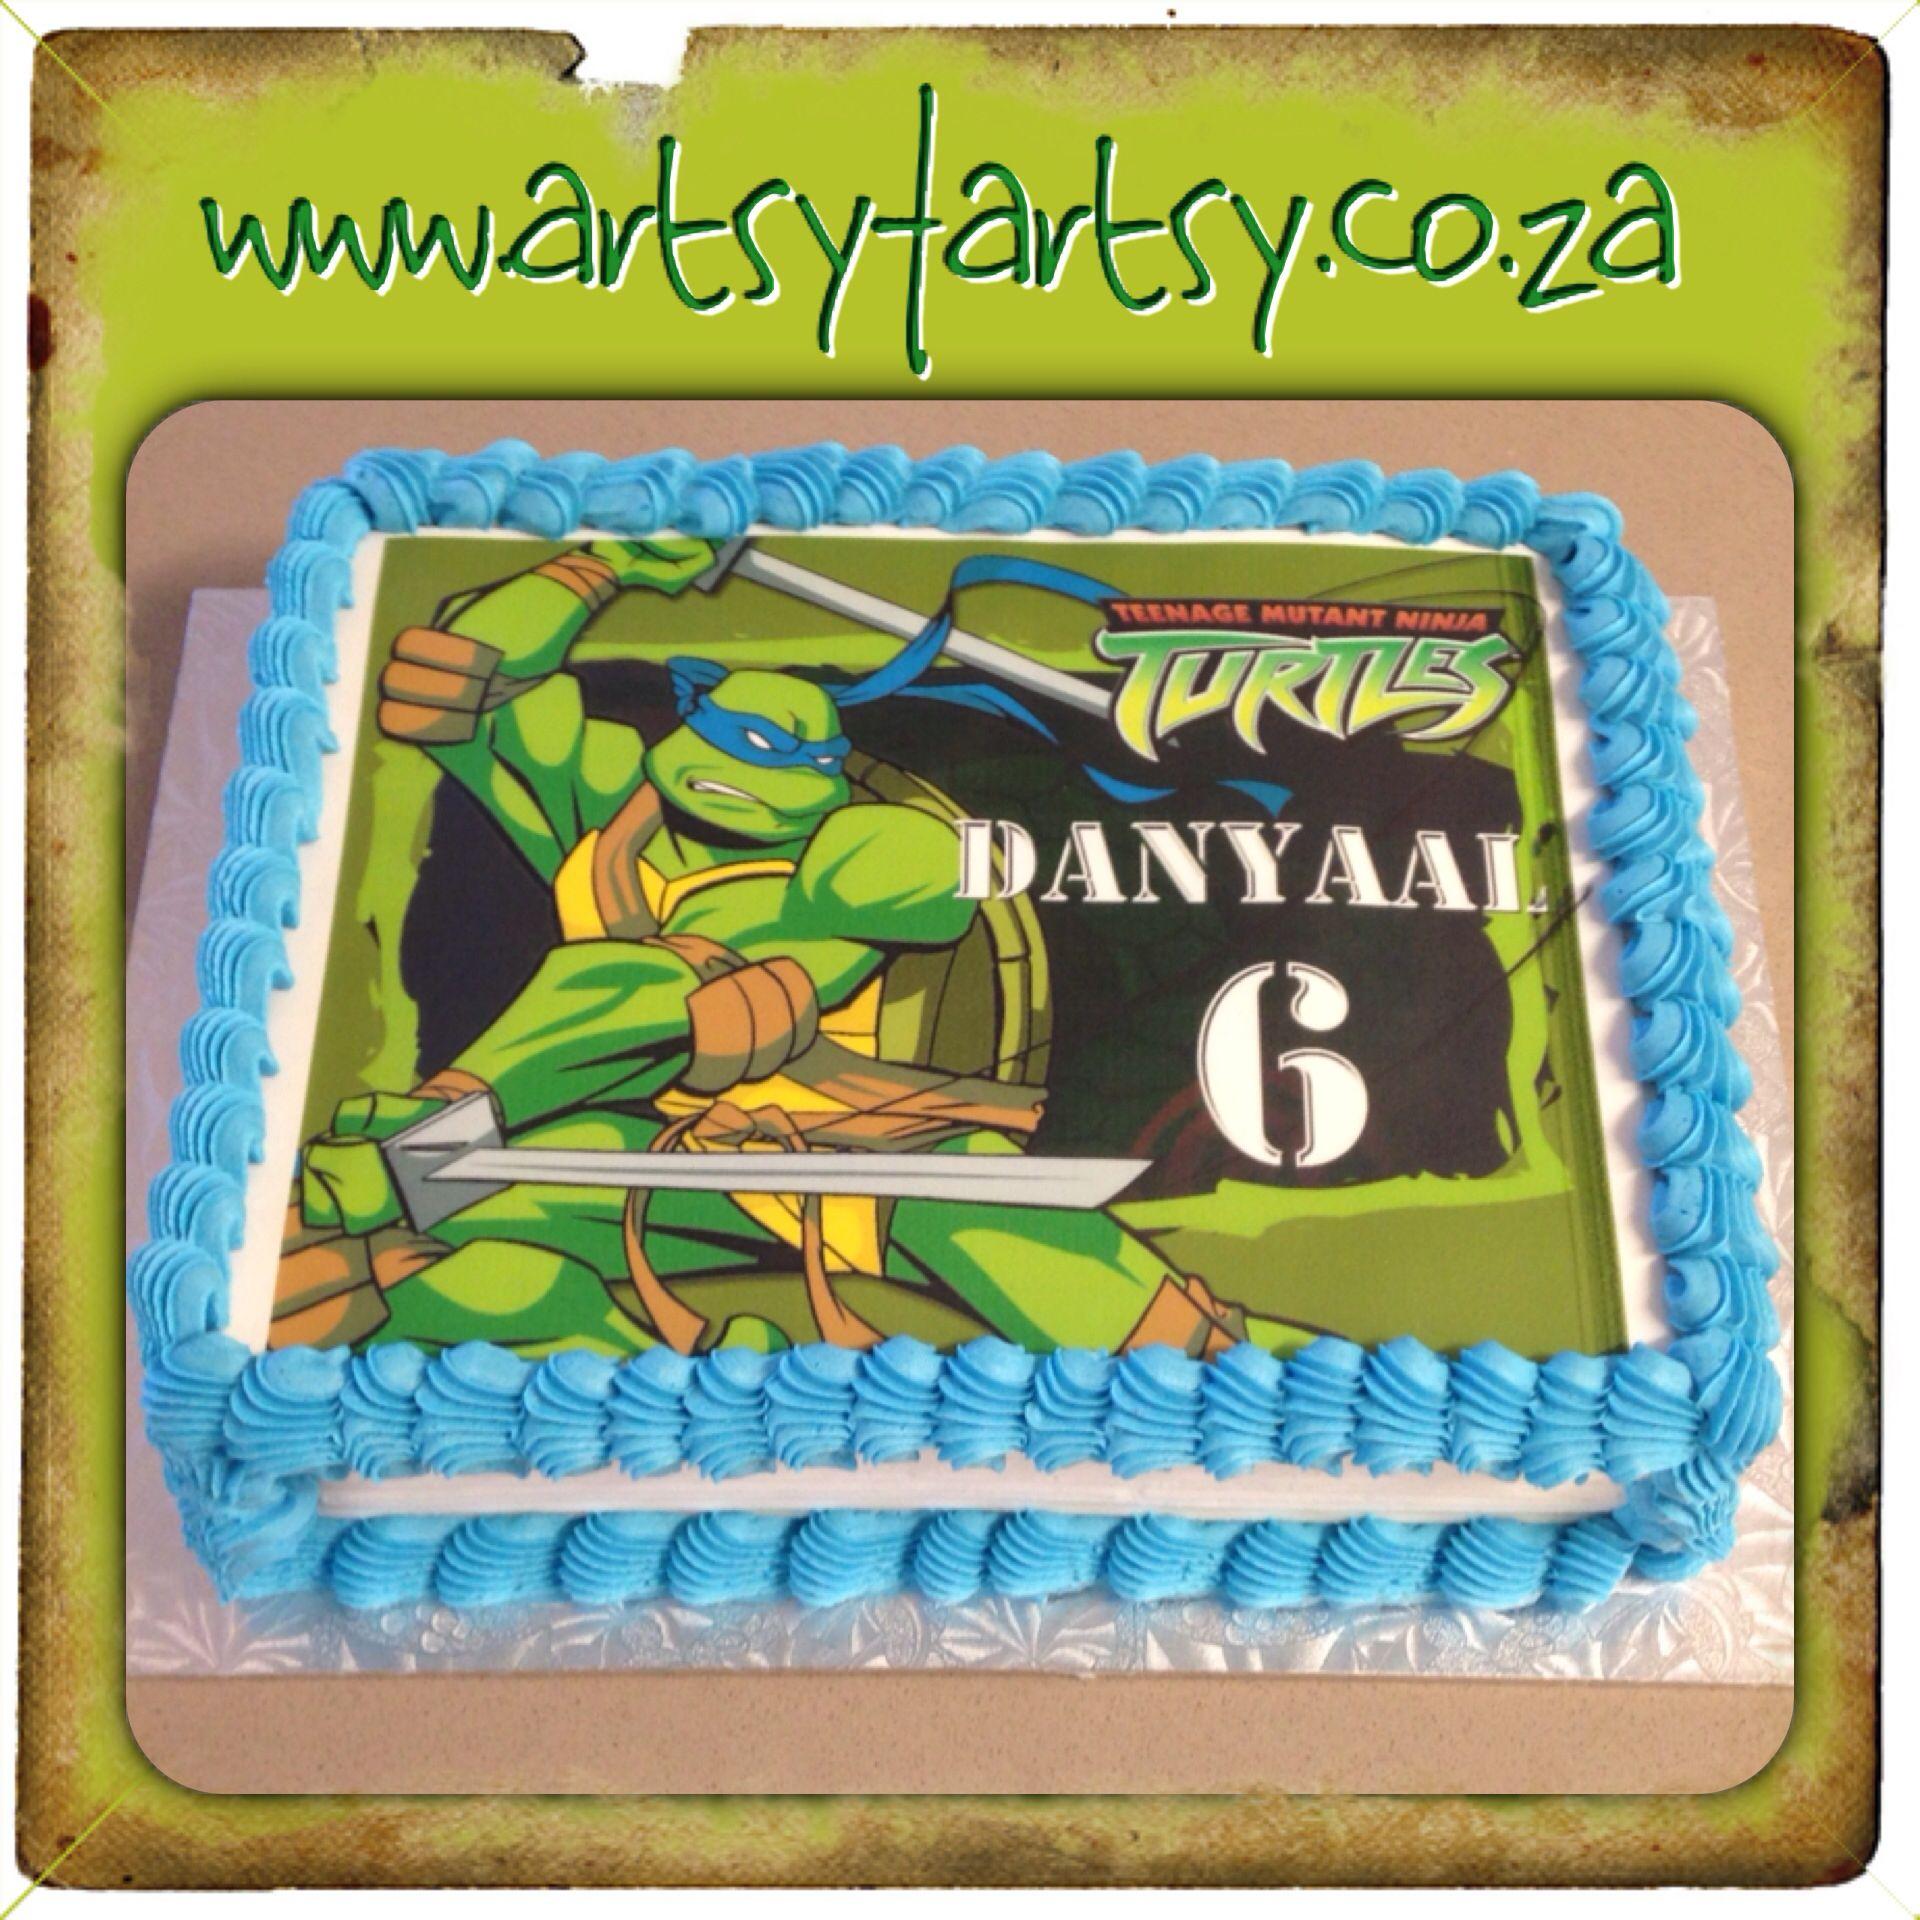 Pin By Mareli Erasmus On Teenage Mutant Ninja Turtle Cakes And Cupcakes Edible Picture Cake Superhero Birthday Cake Monster High Cakes